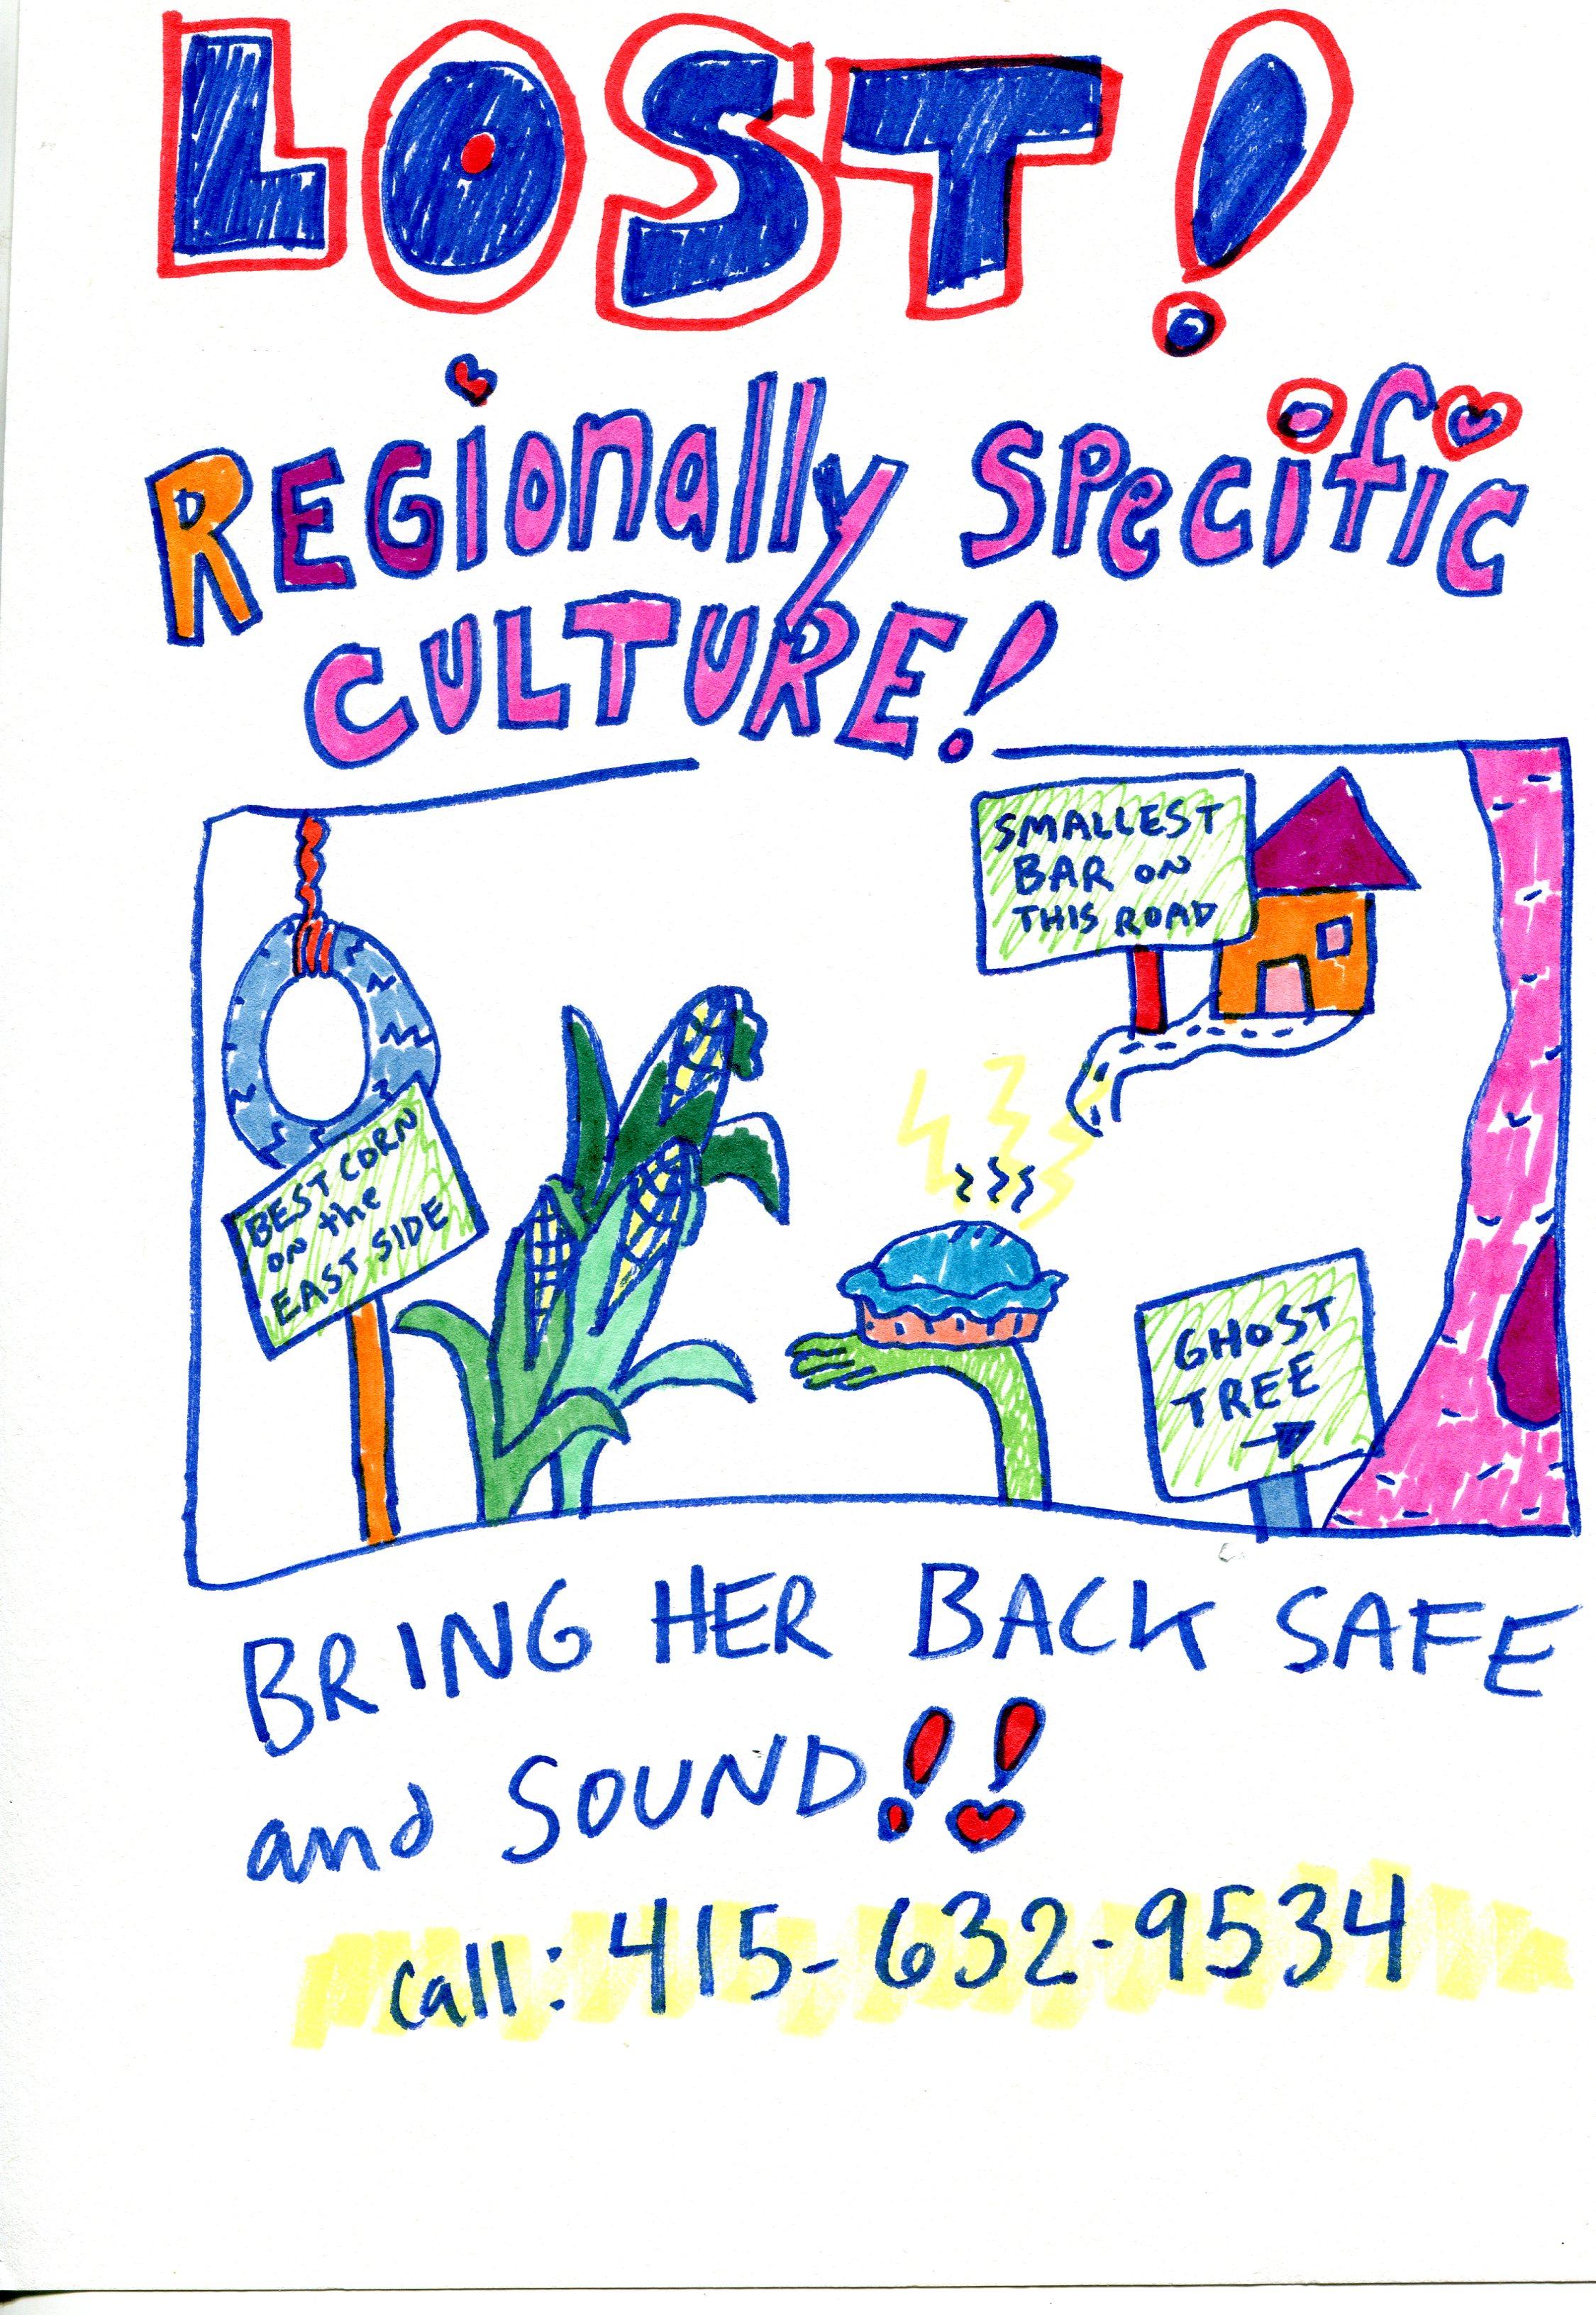 regionallyspecificculture.jpg